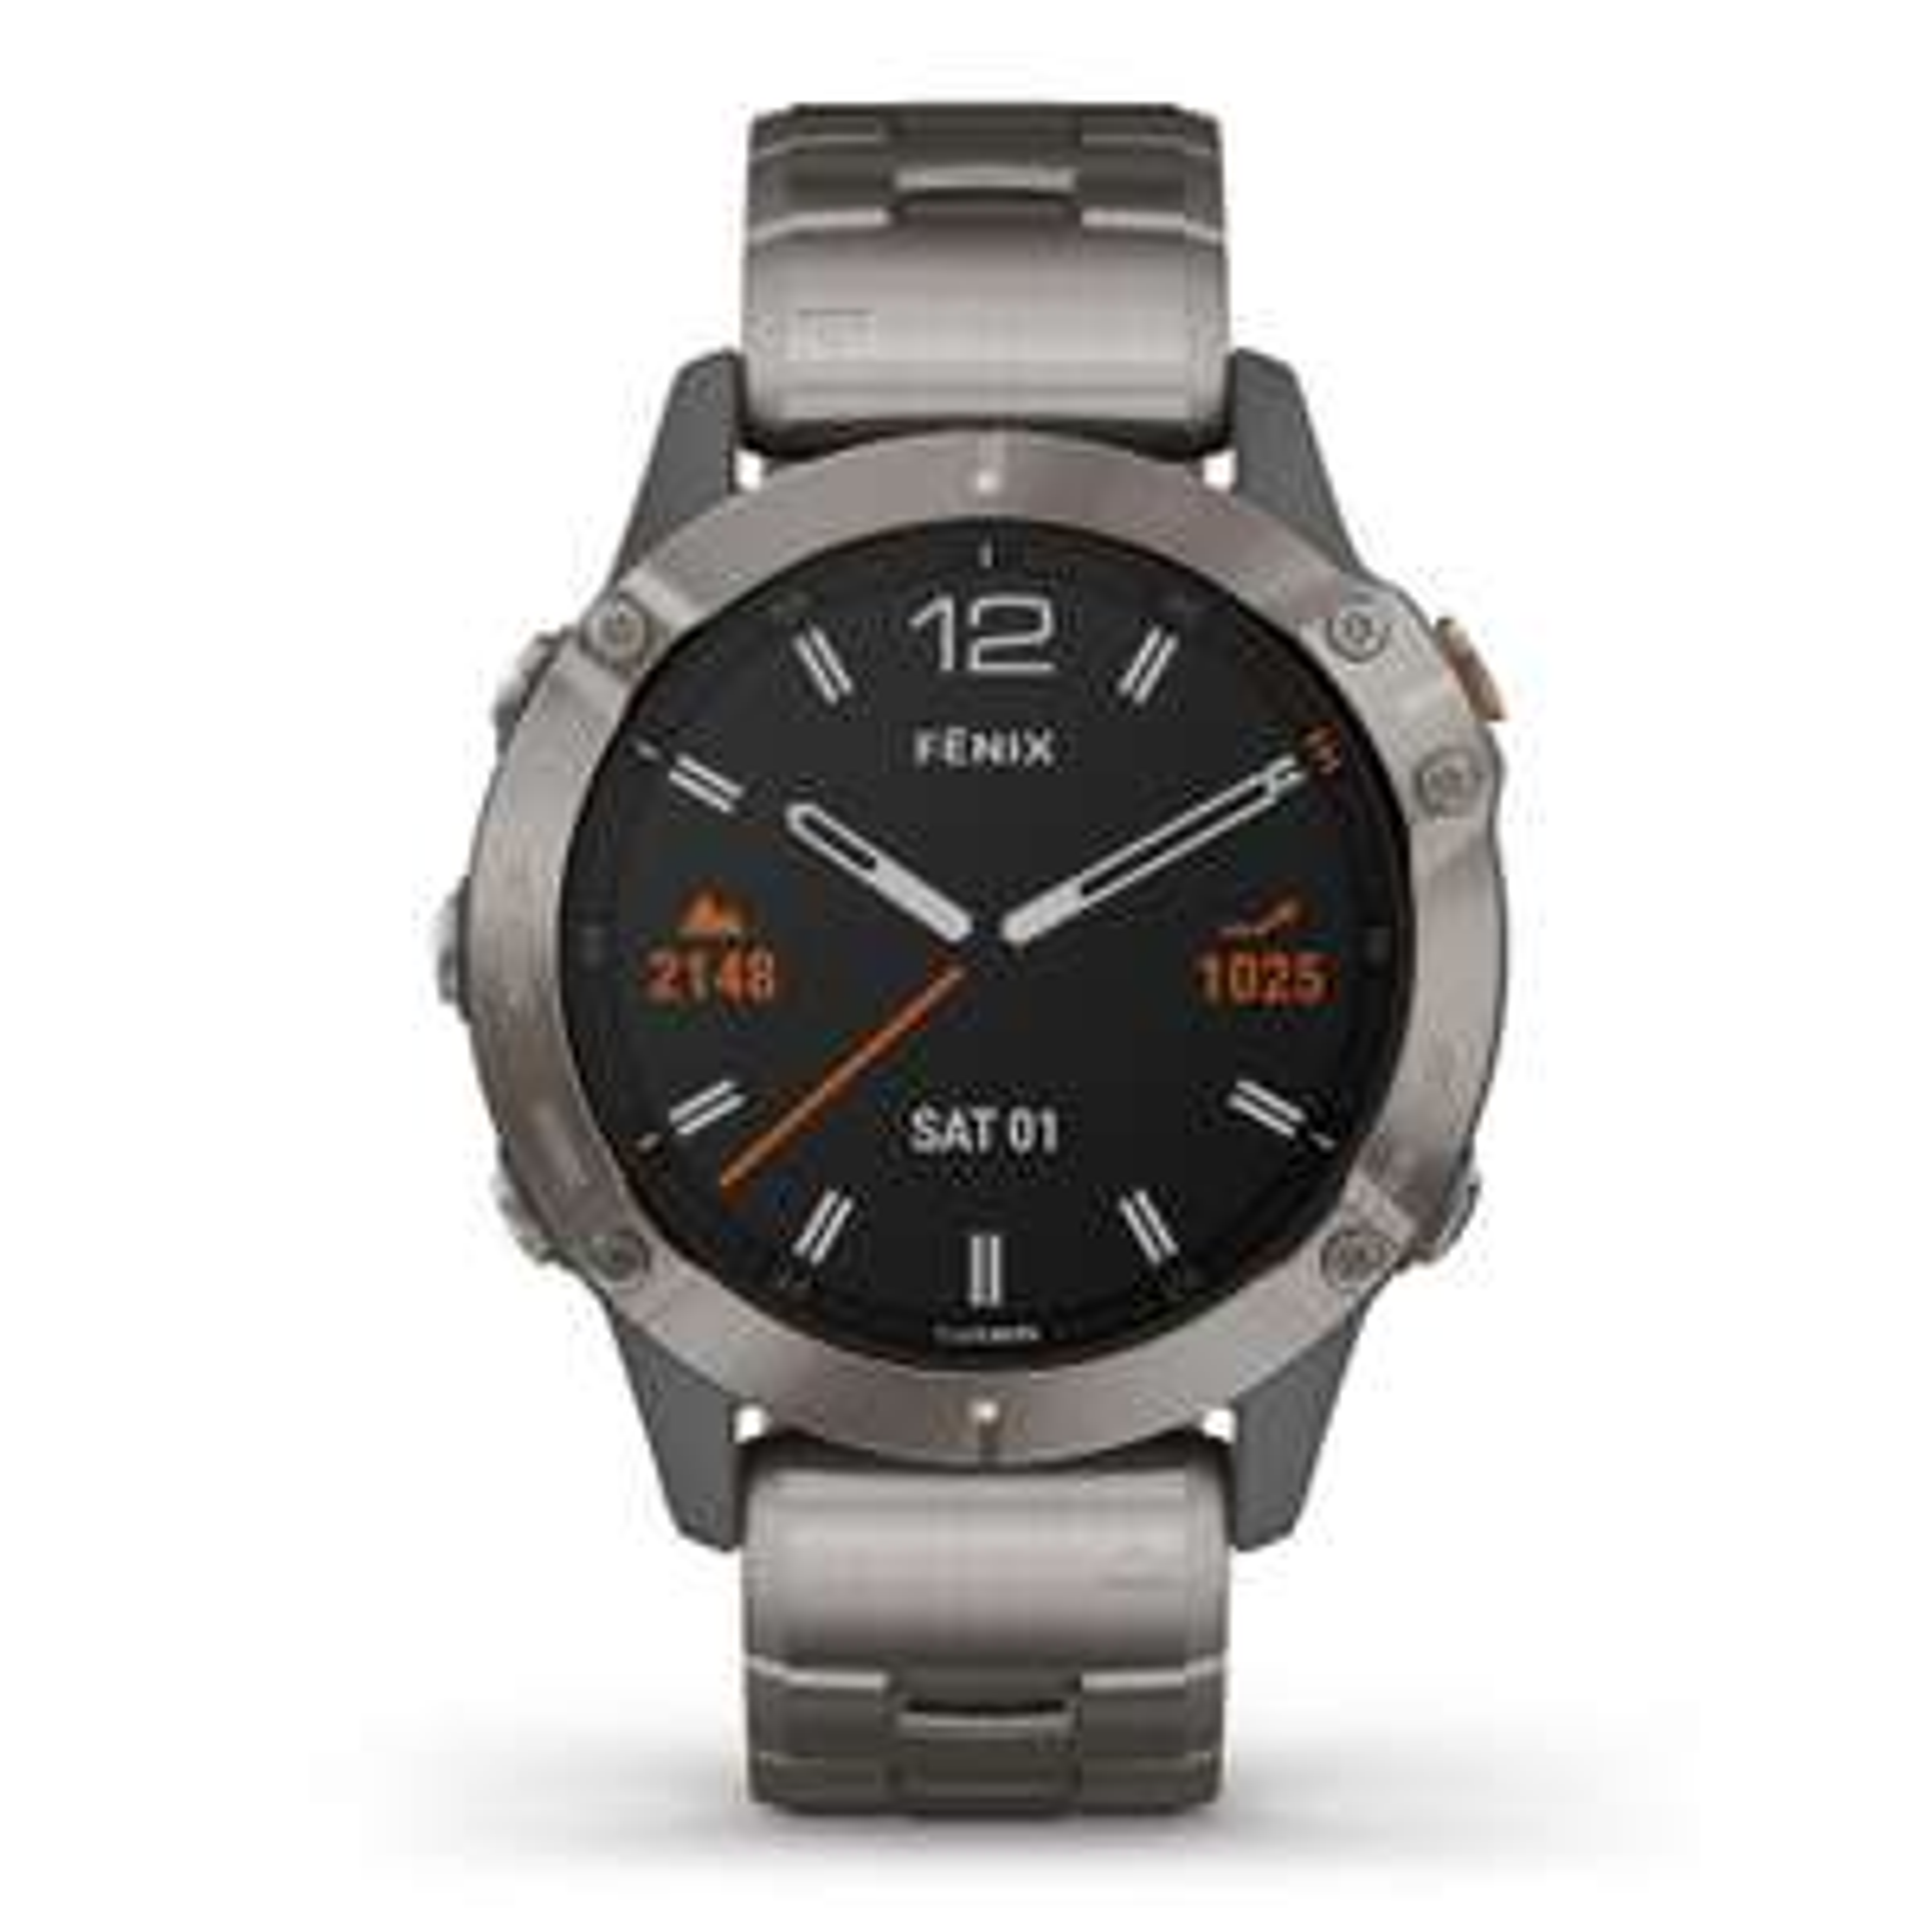 Garmin Fenix 6 Sapphire Titanium Watch (includes Orange strap) £640 at Beaverbrooks